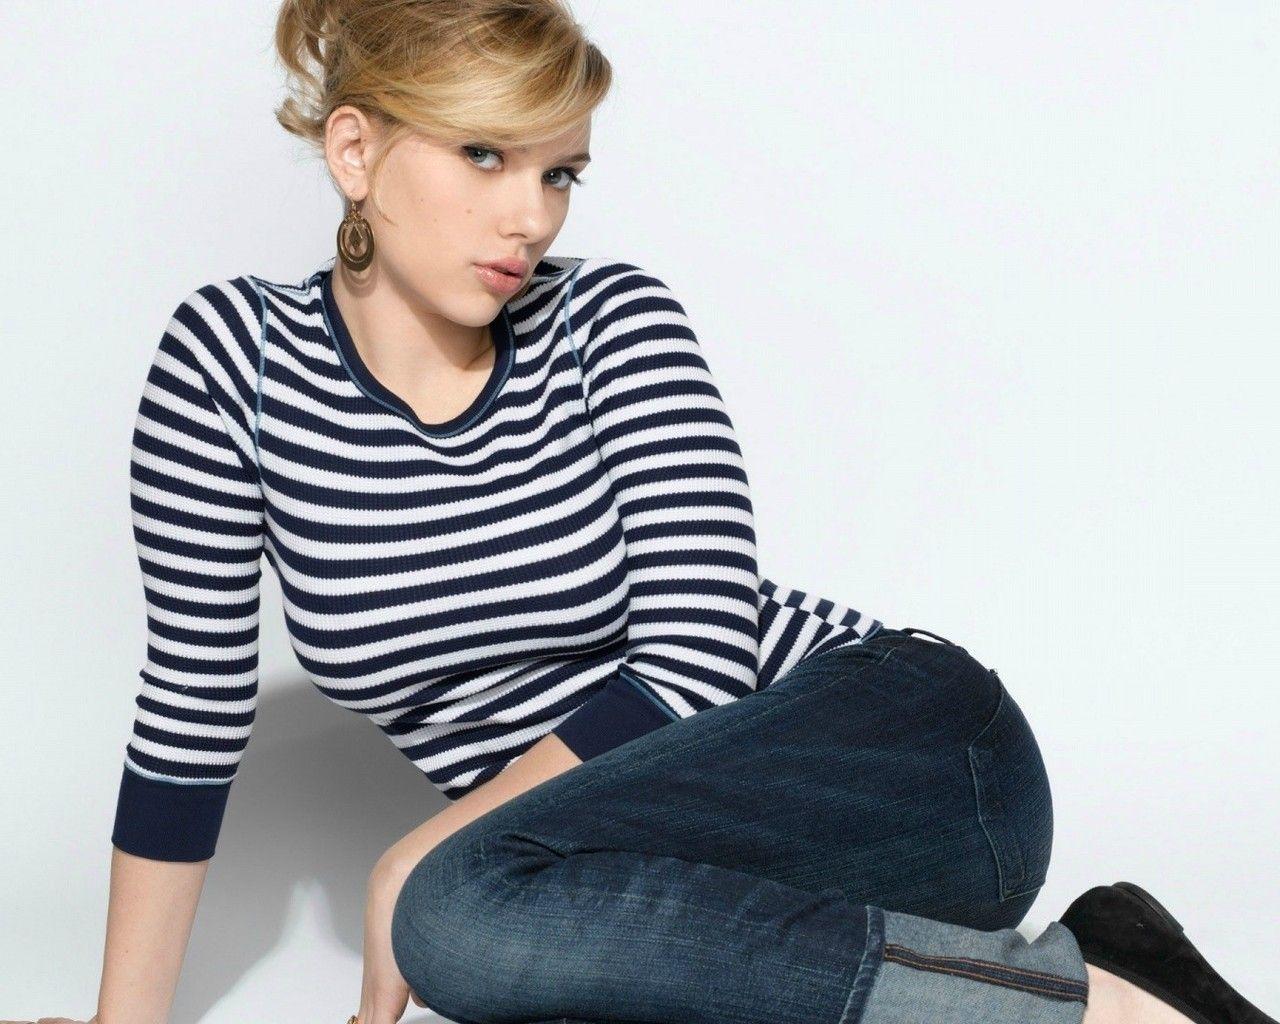 Blondes Women Jeans Scarlett Johansson Actress Celebrity